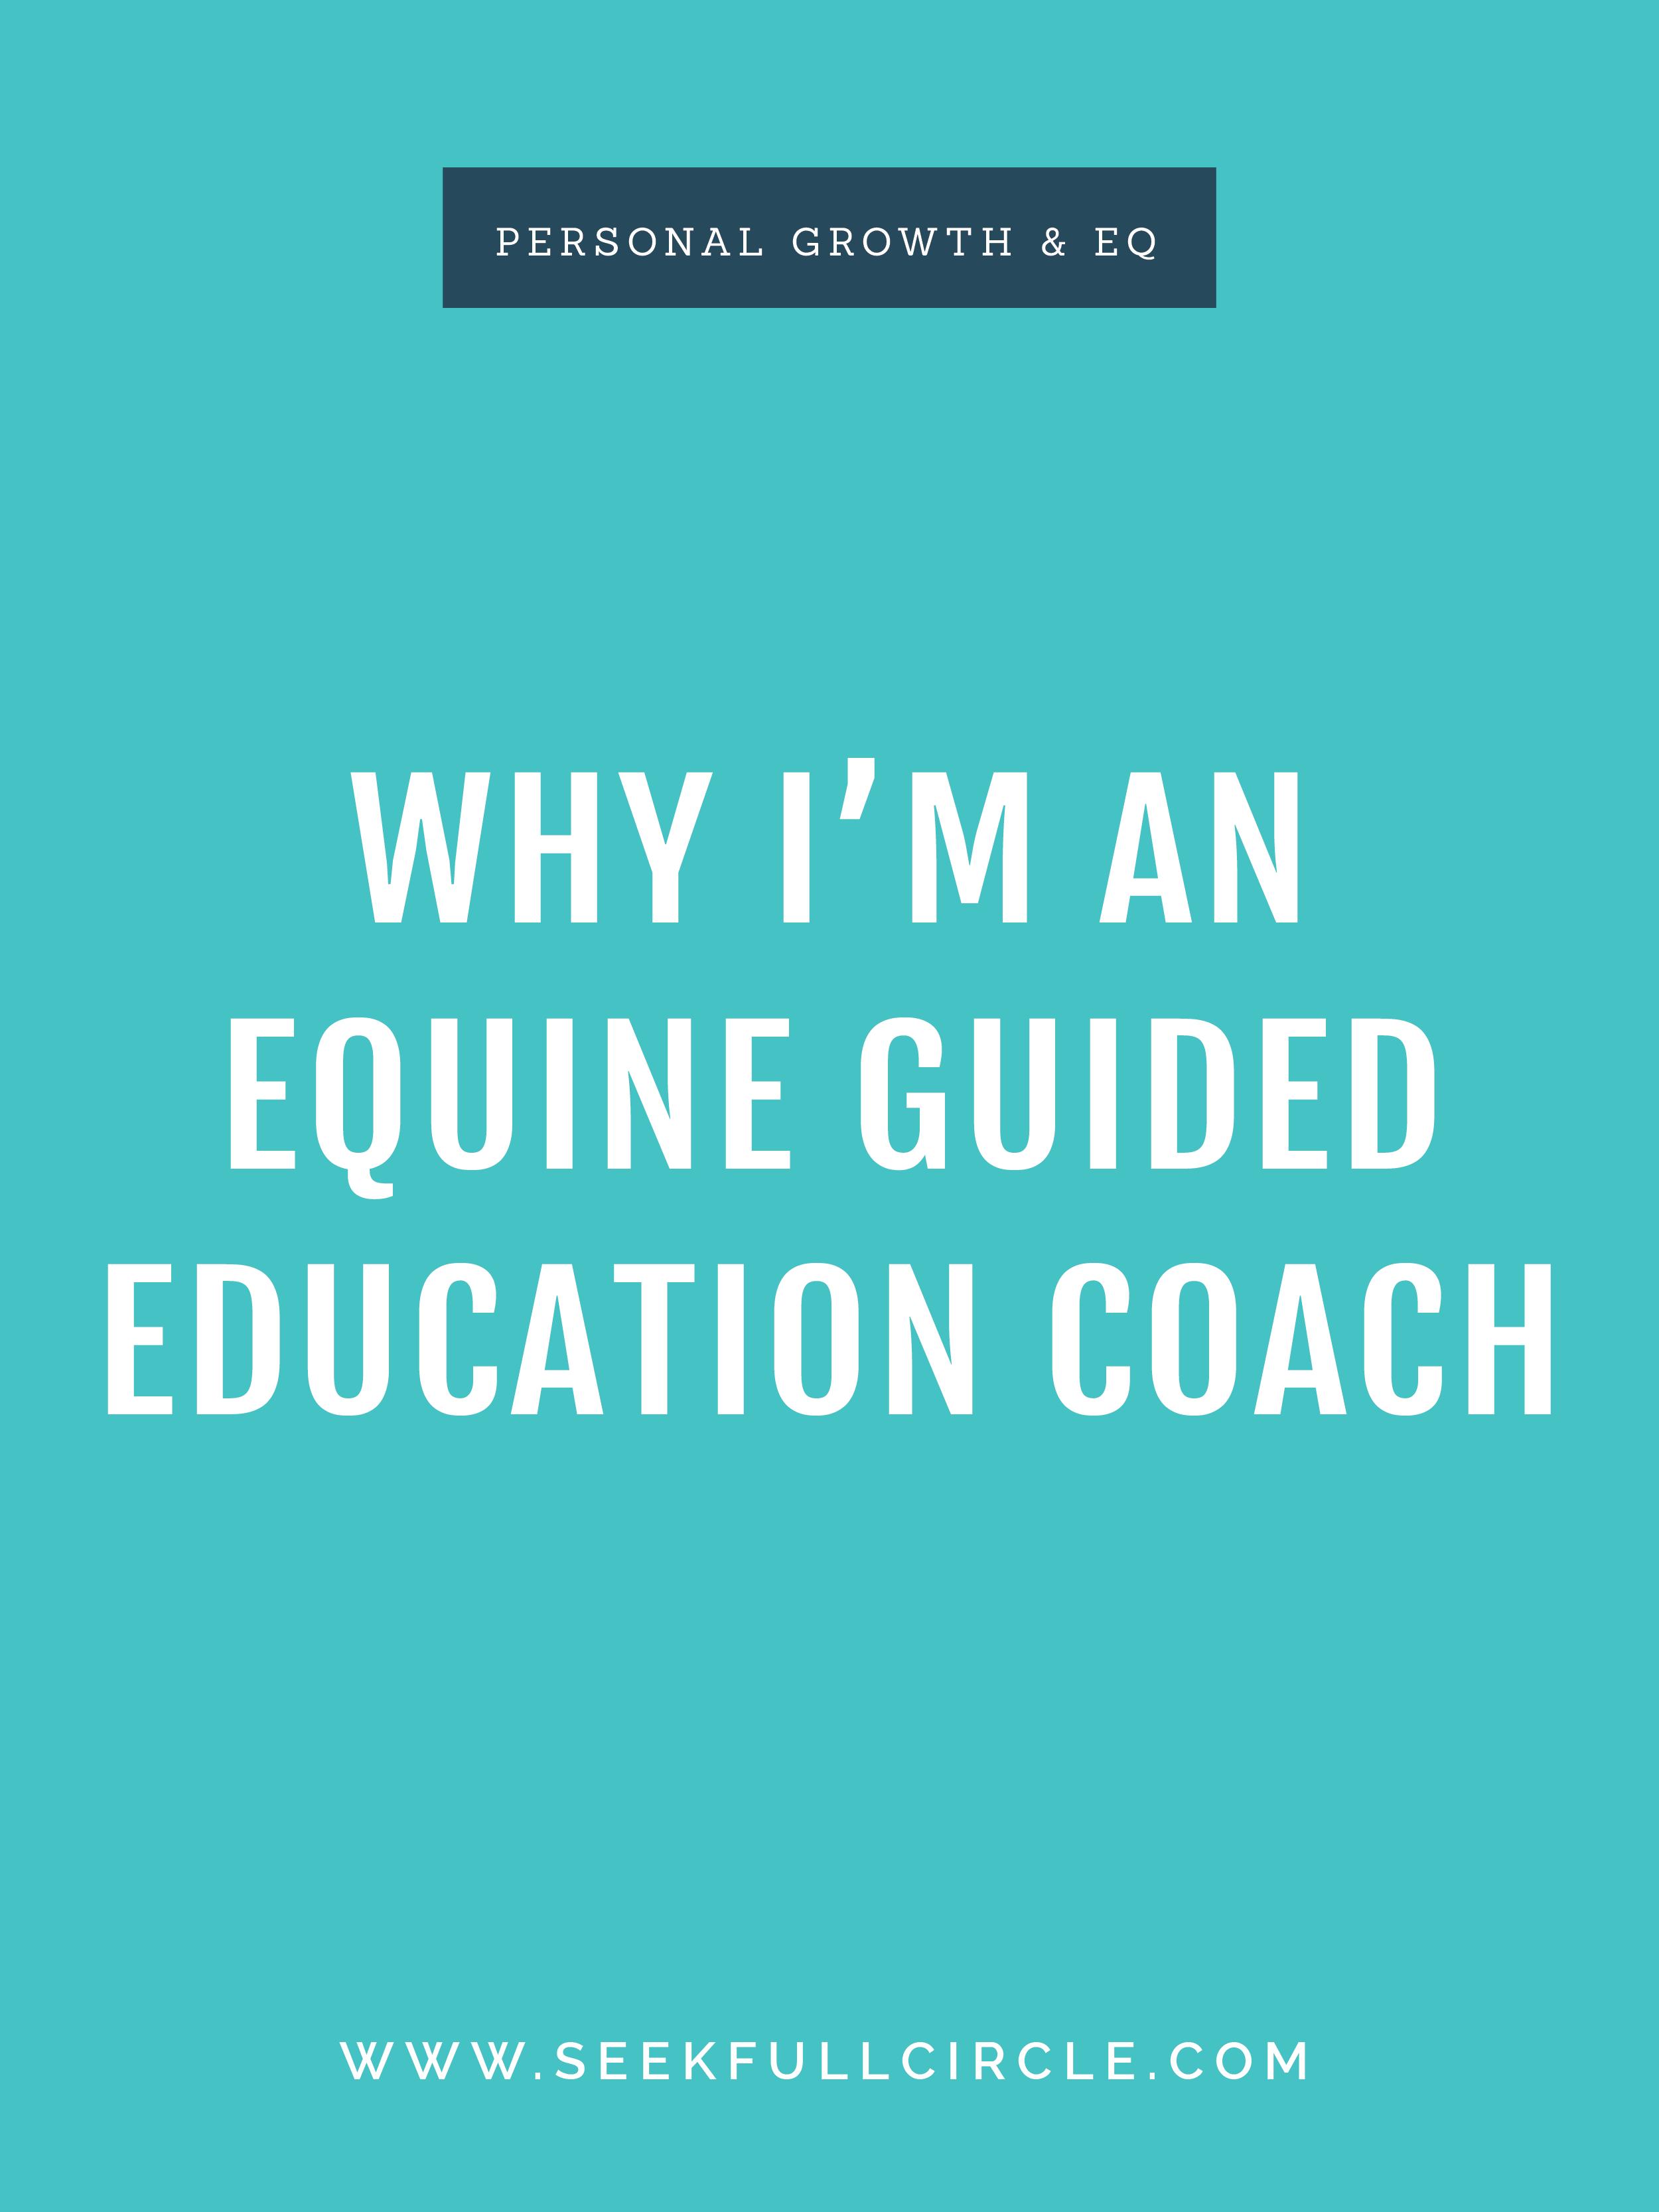 kim waltman fullcircle creative + coaching equine guided education EQ blog